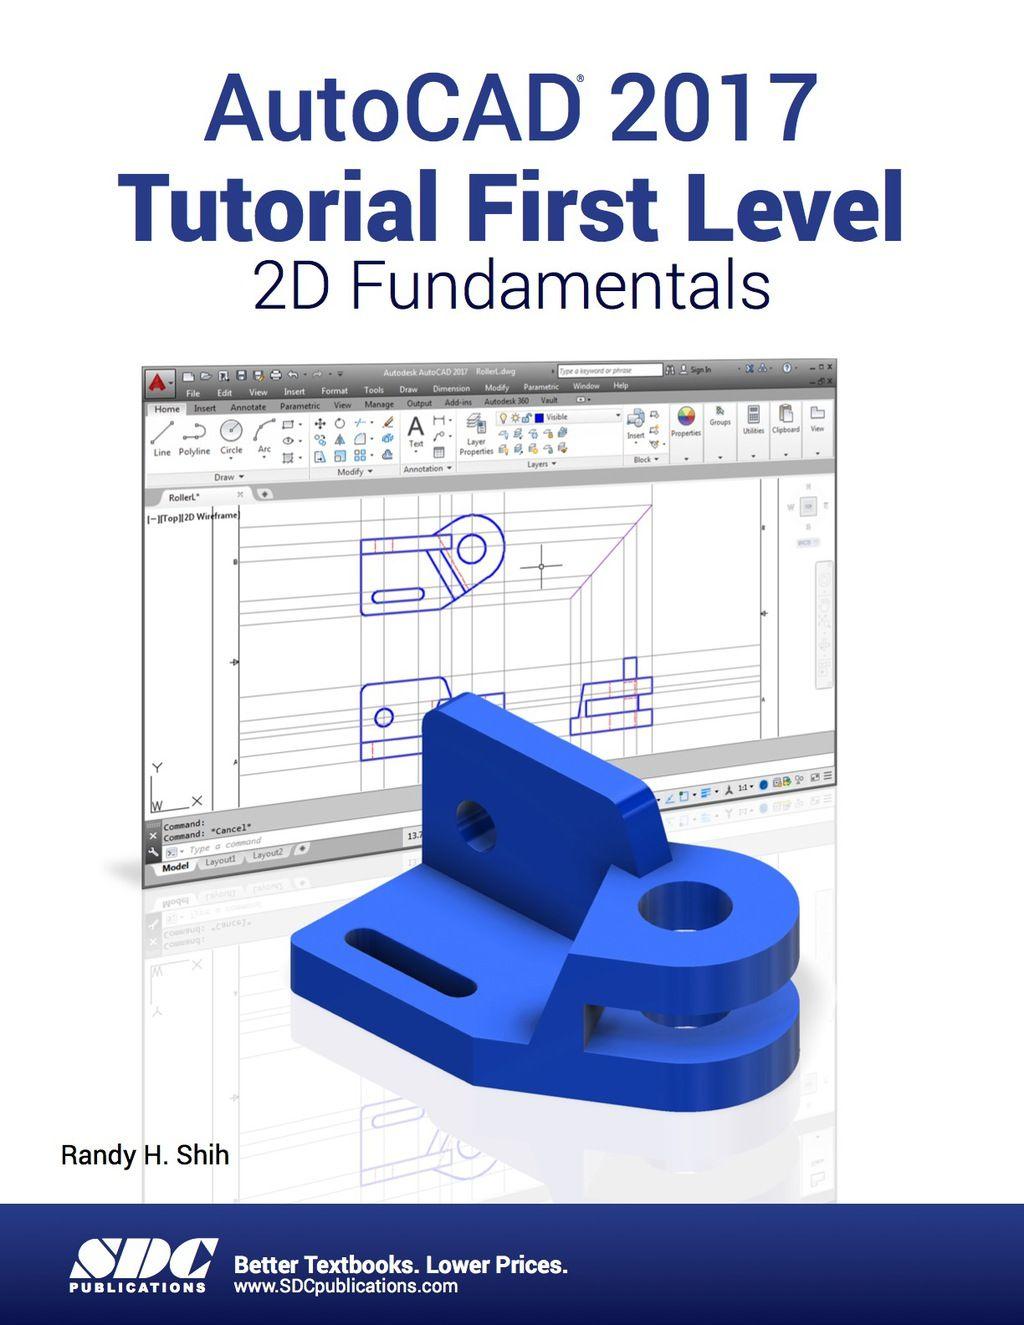 Autocad 2017 Tutorial First Level 2d Fundamentals Ebook In 2020